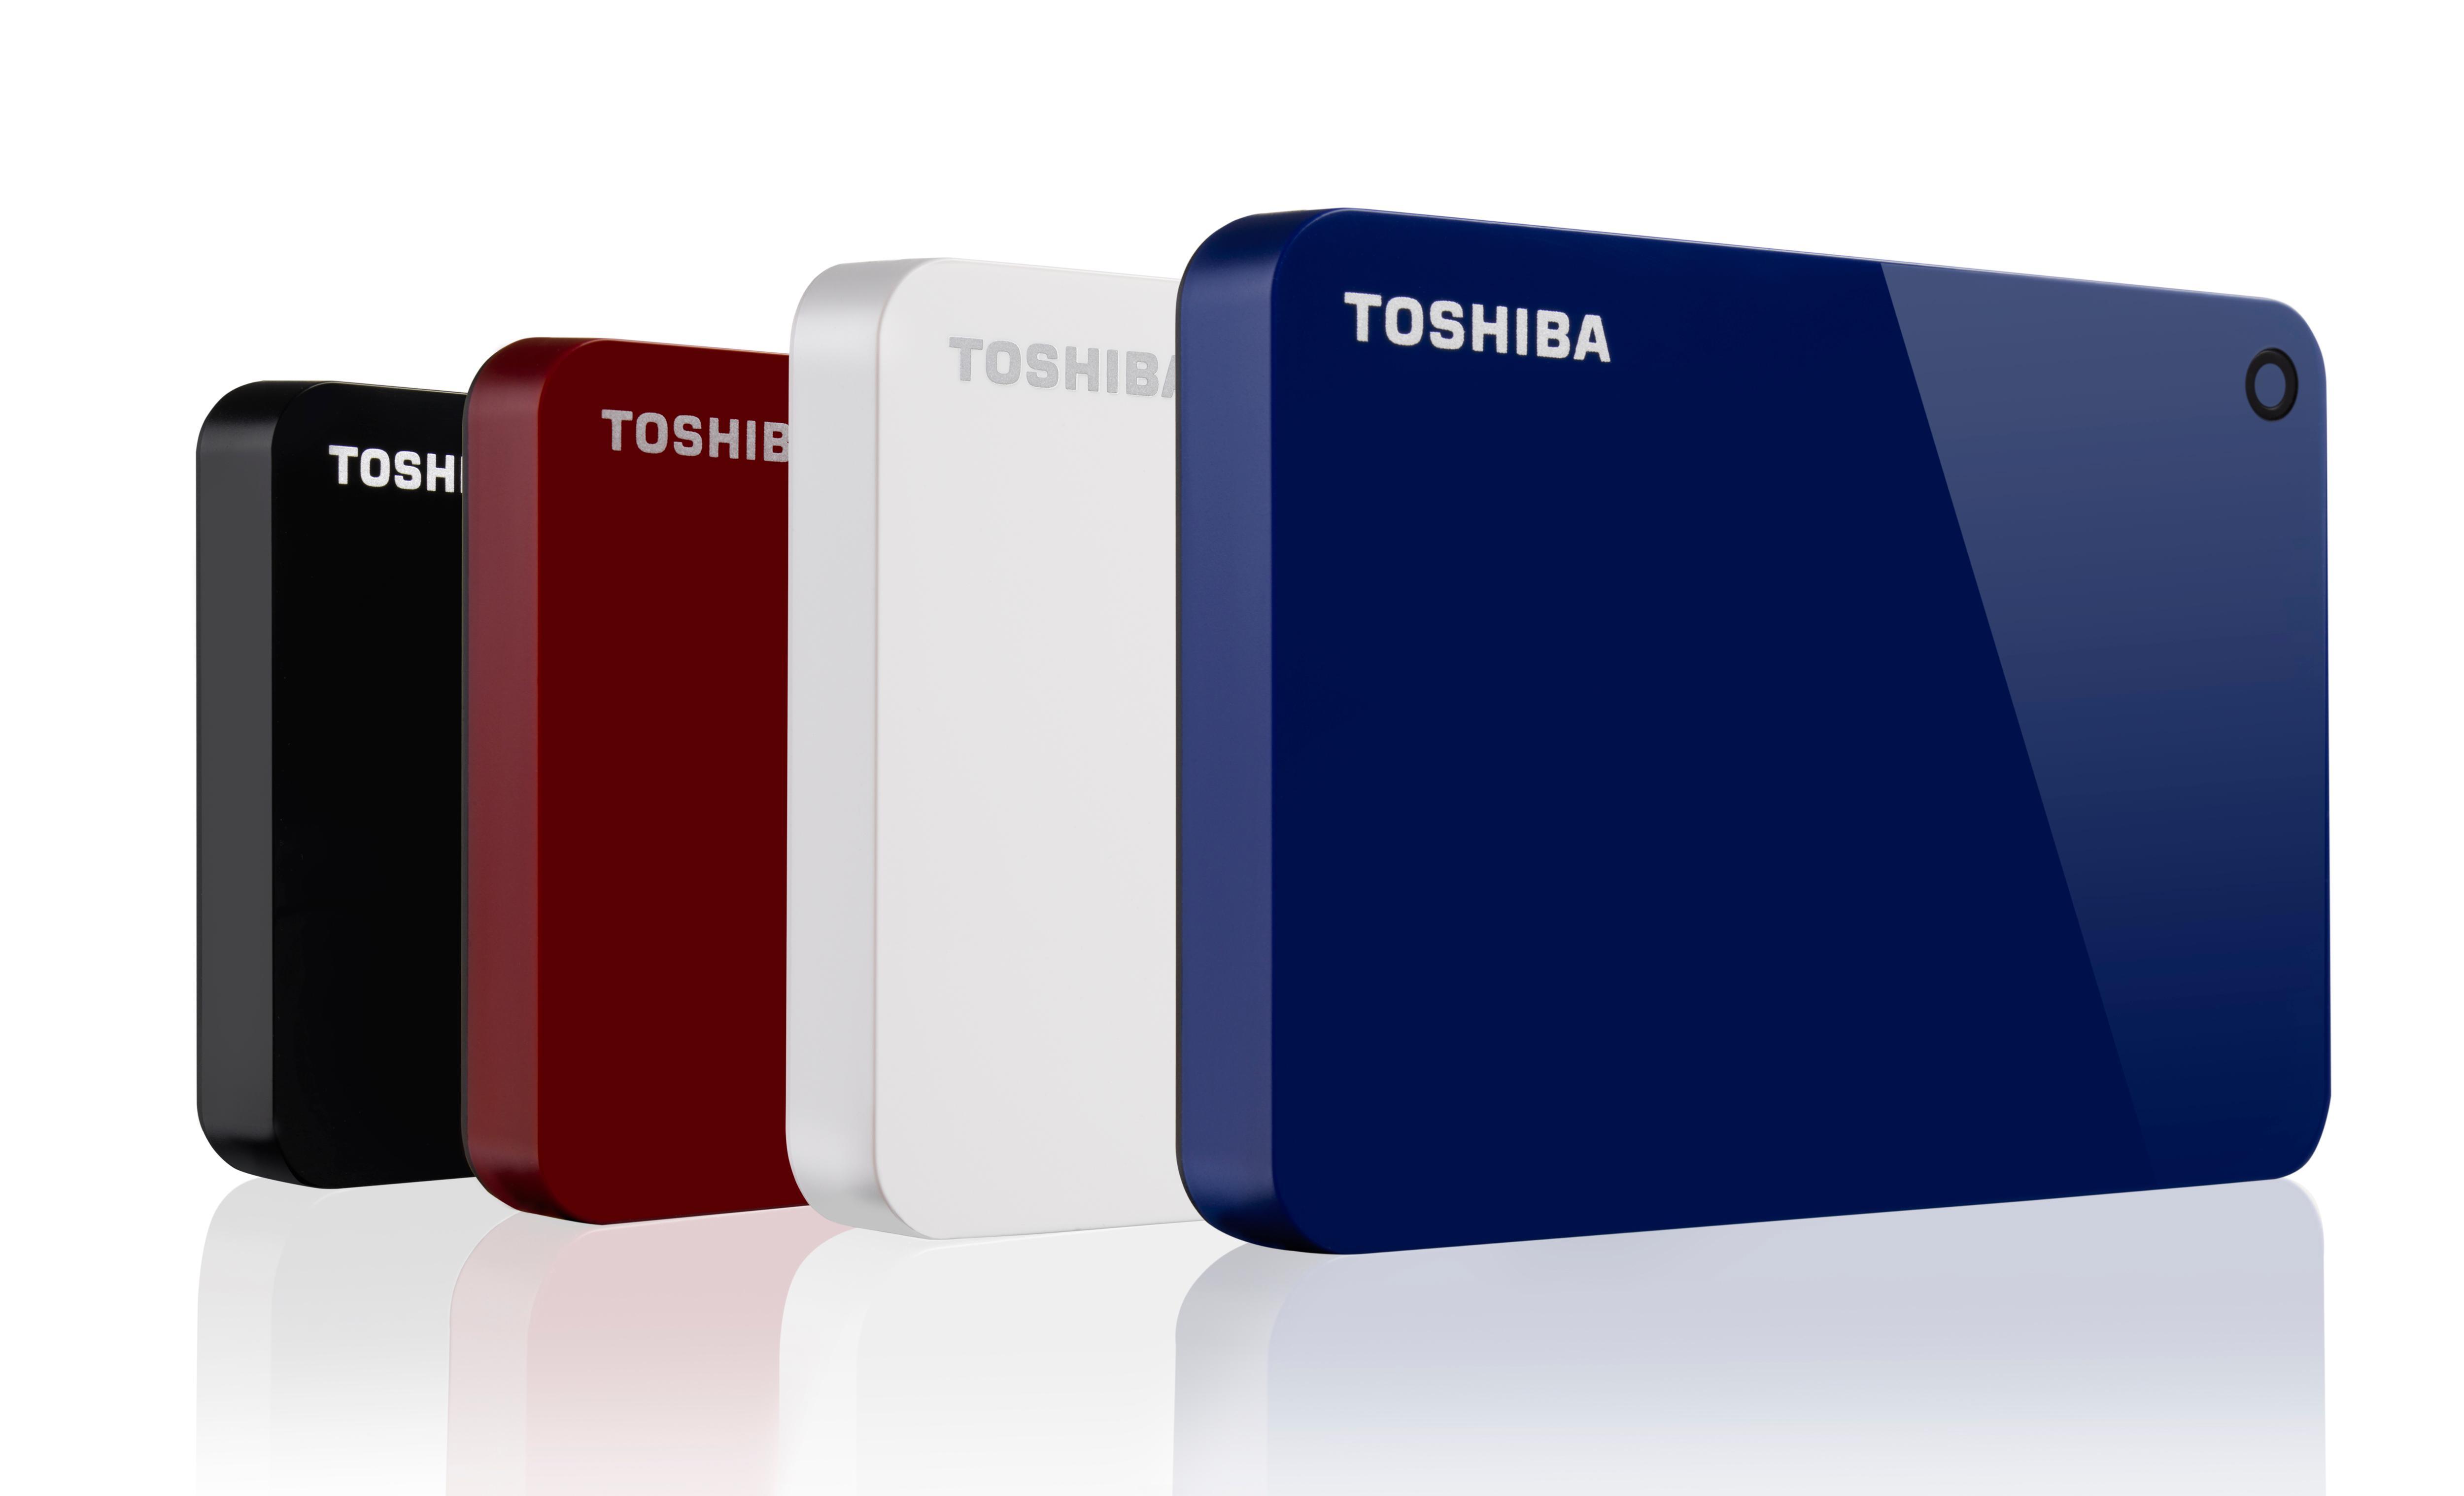 Psc0 Laptop Toshiba Wiring Diagram Schematic Diagram